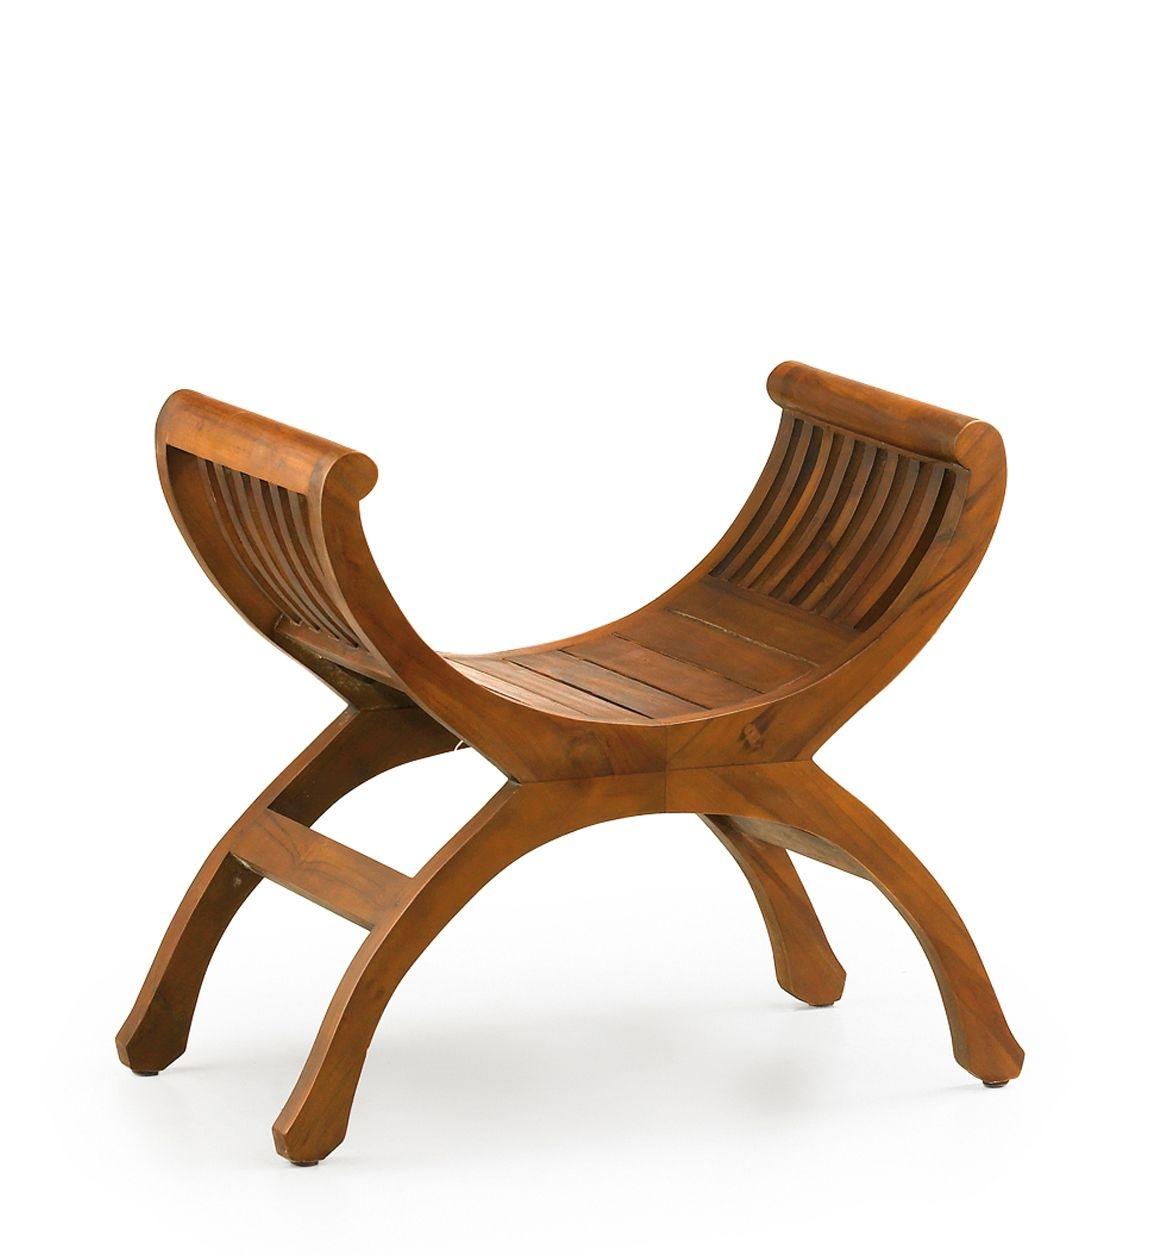 Taburet din lemn, Yuyu Nuc, l62xA35xH60 cm imagine